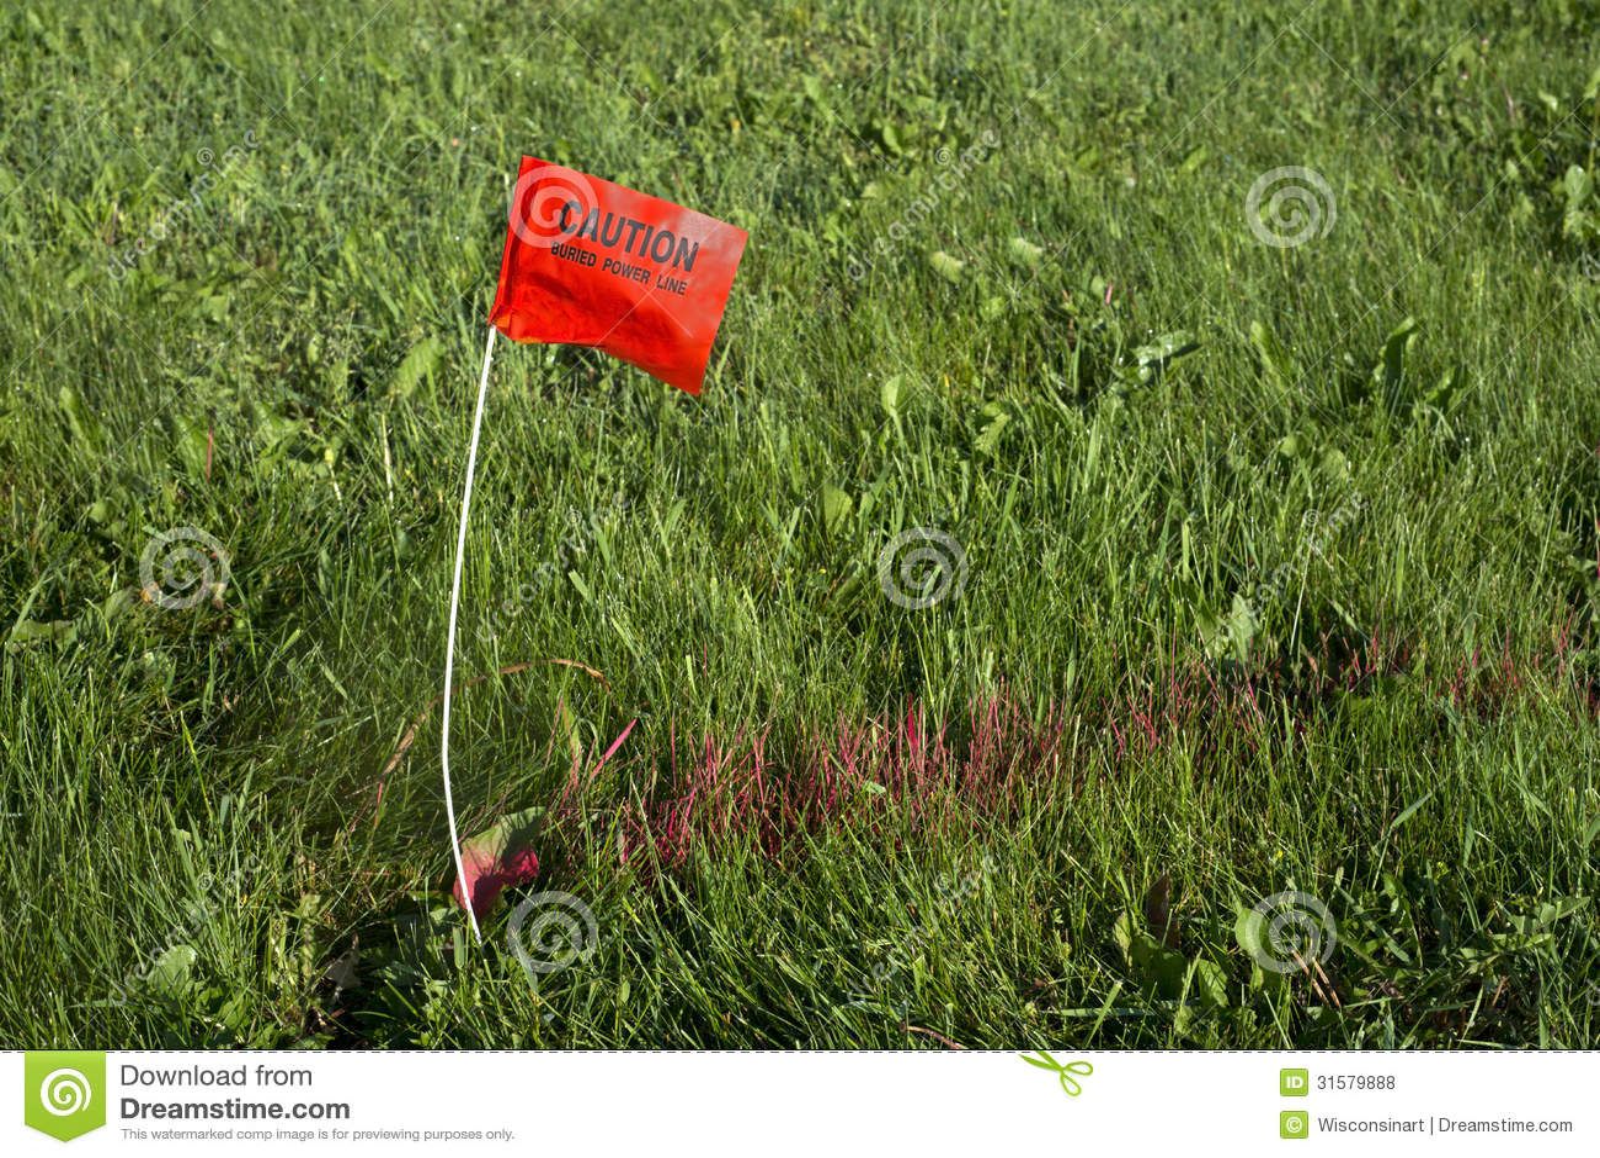 Digger Hotline Flag Buried Electrical Power Line Royalty